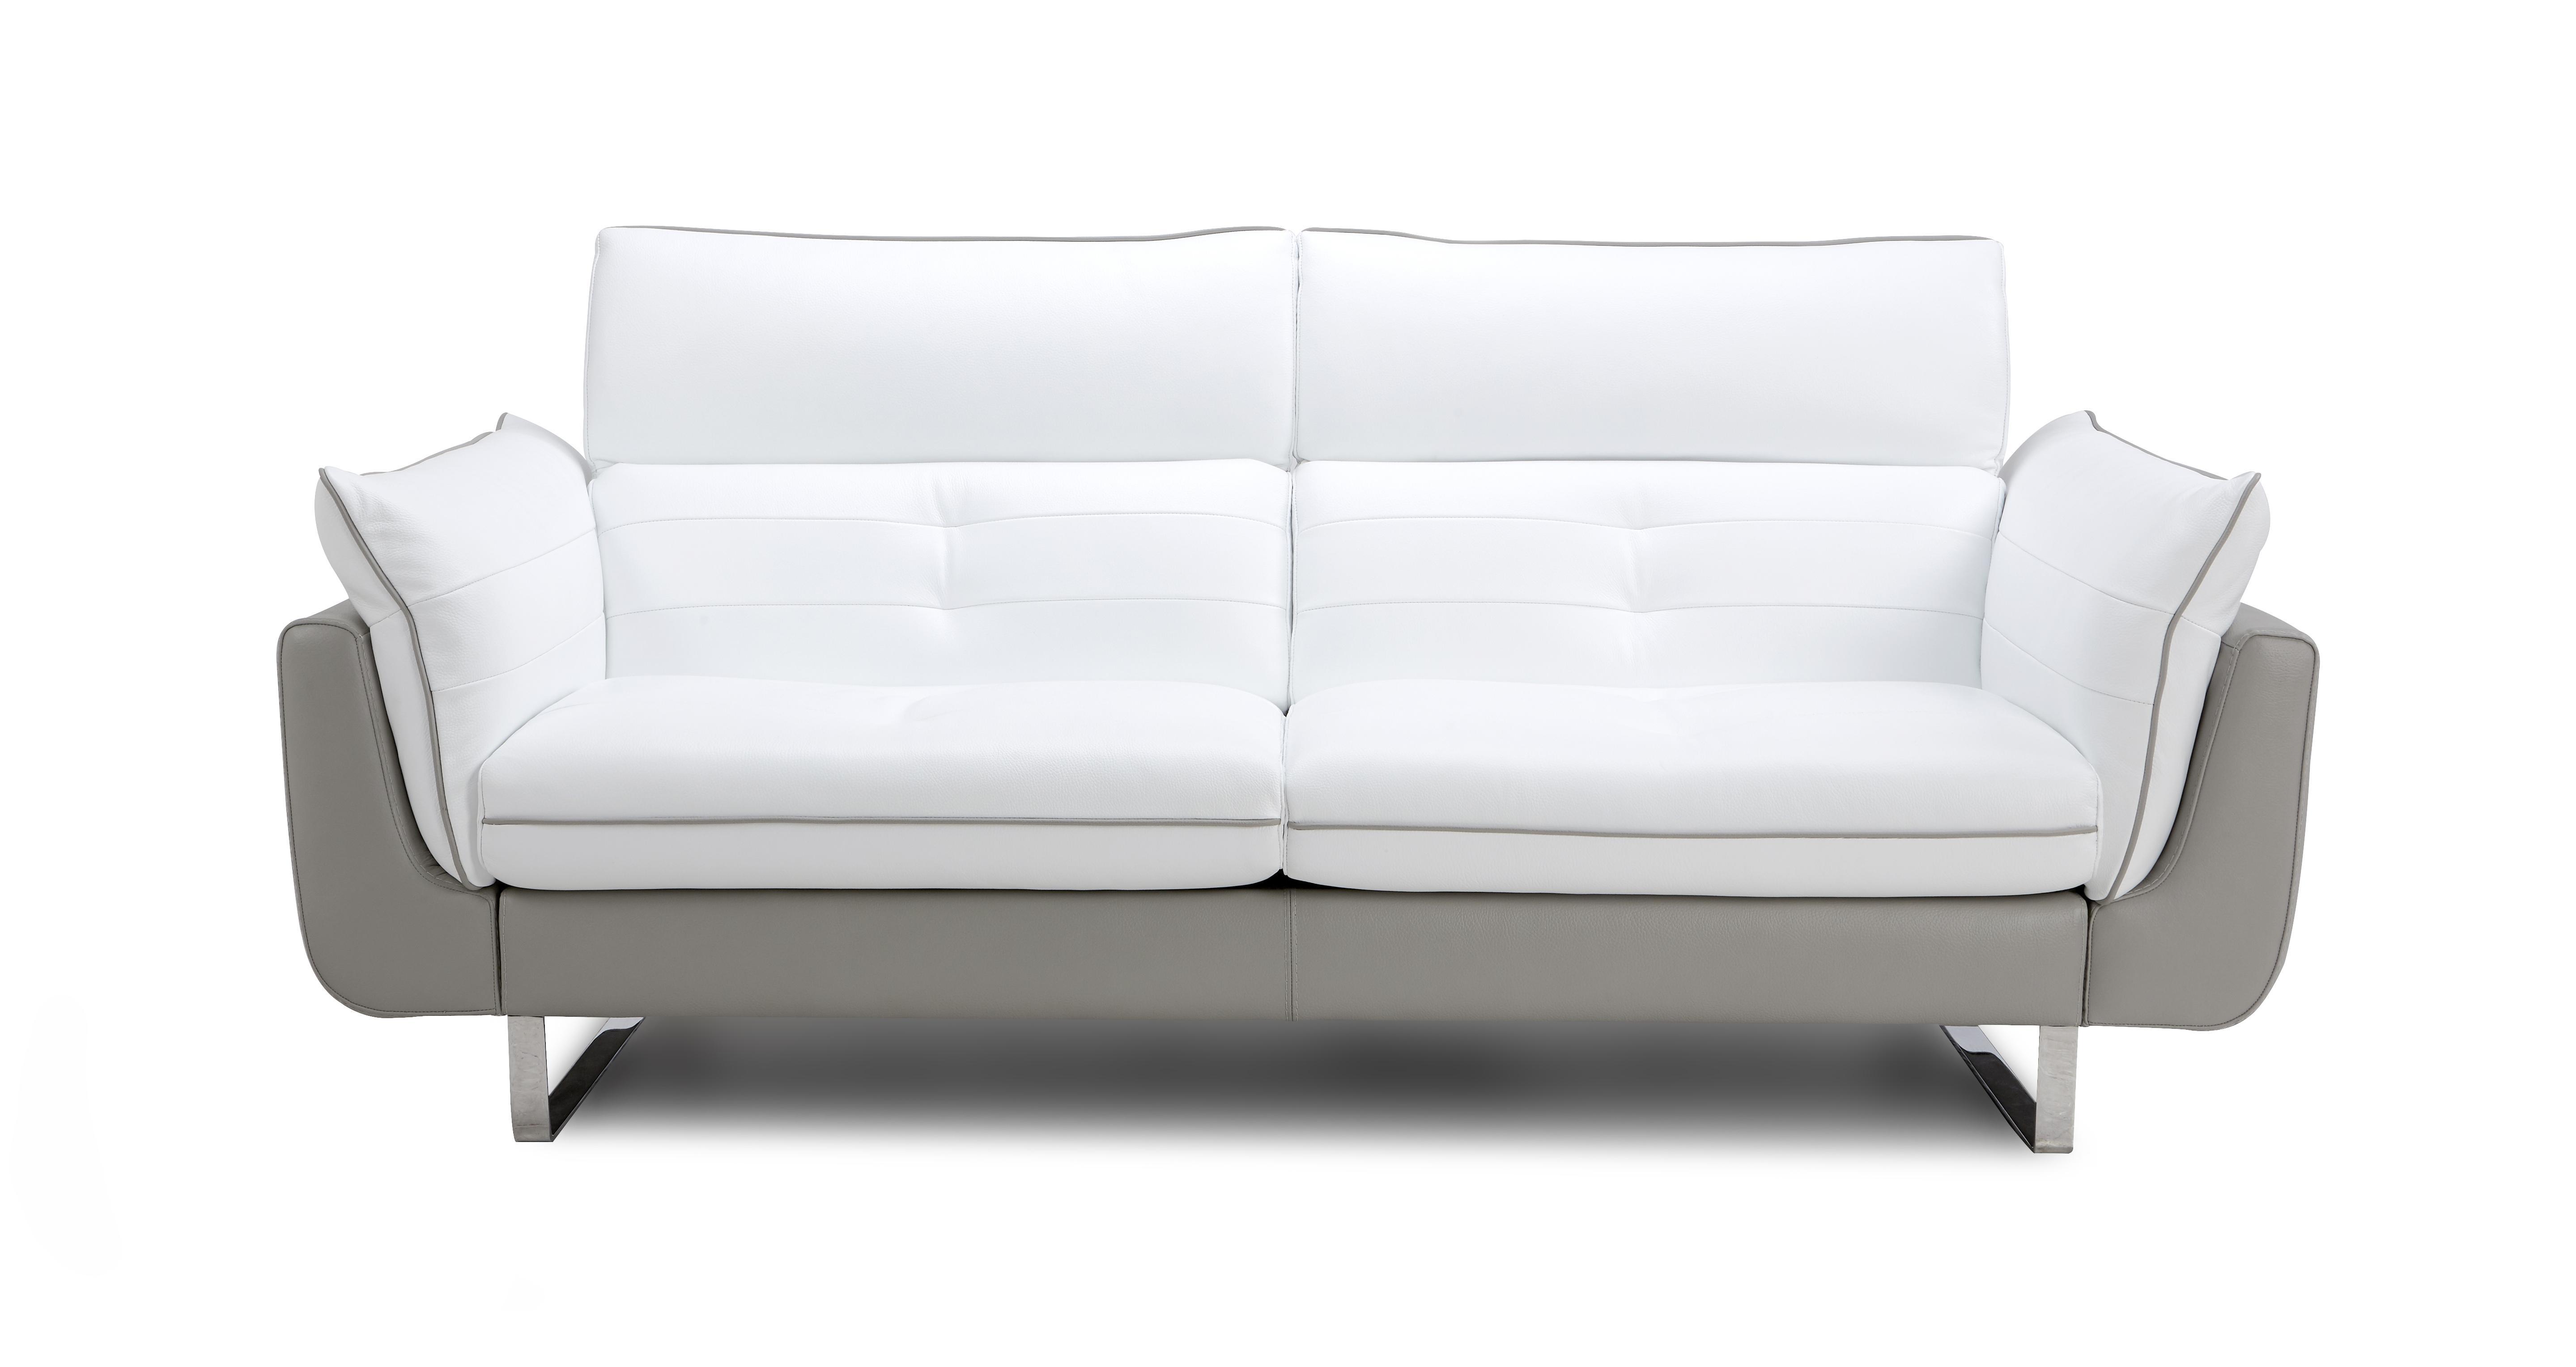 Positano 3 Seater Sofa Taiga | DFS